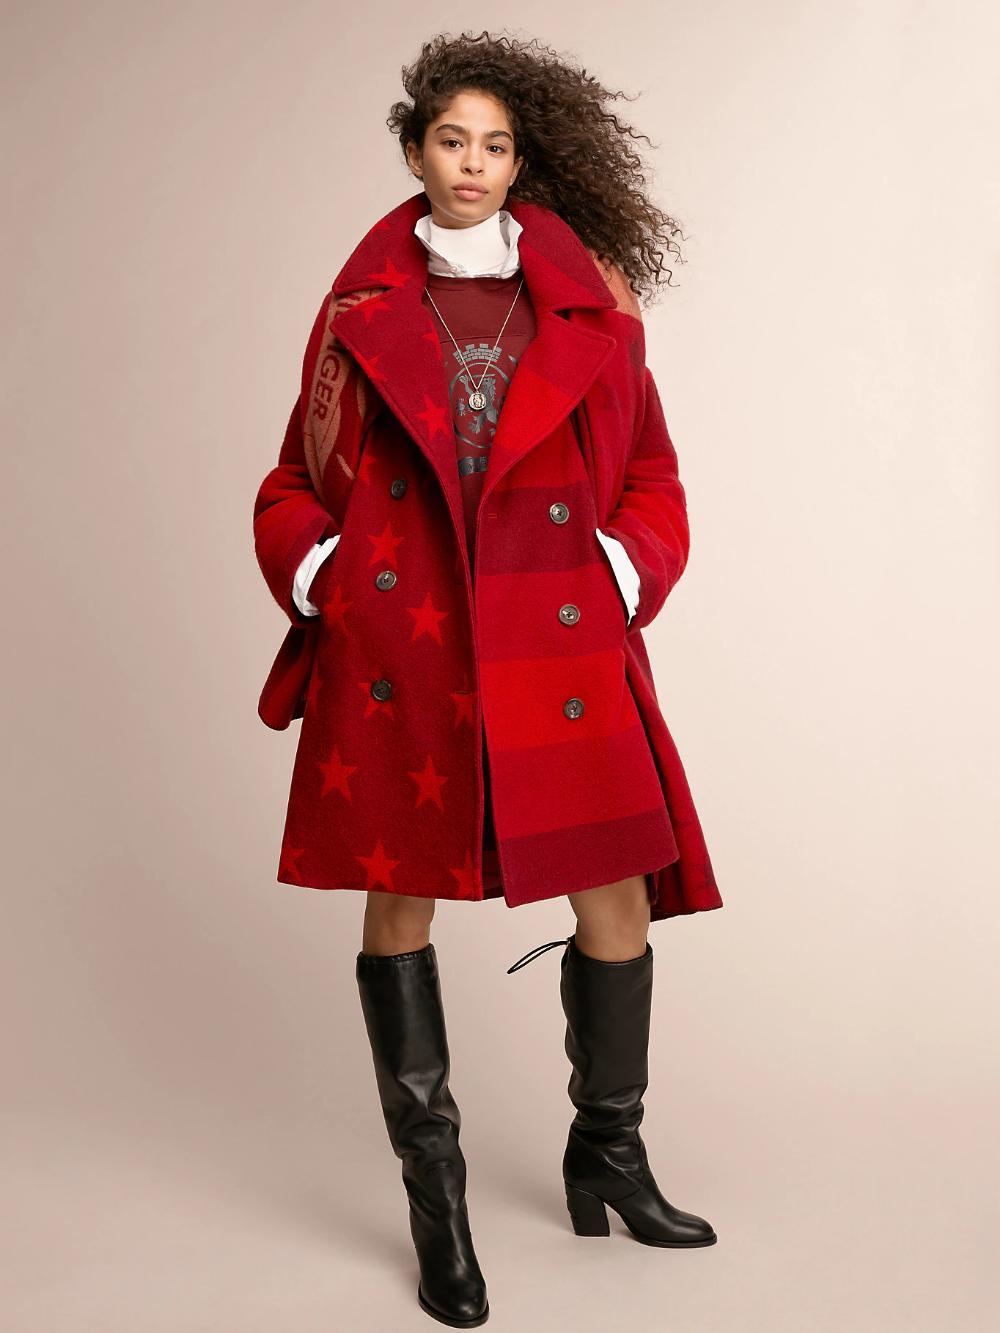 Crest Quilted Blanket Coat Cabernet Multi Tommy Hilfiger Coat Women S Coats Jackets Tommy Hilfiger [ 1333 x 1000 Pixel ]